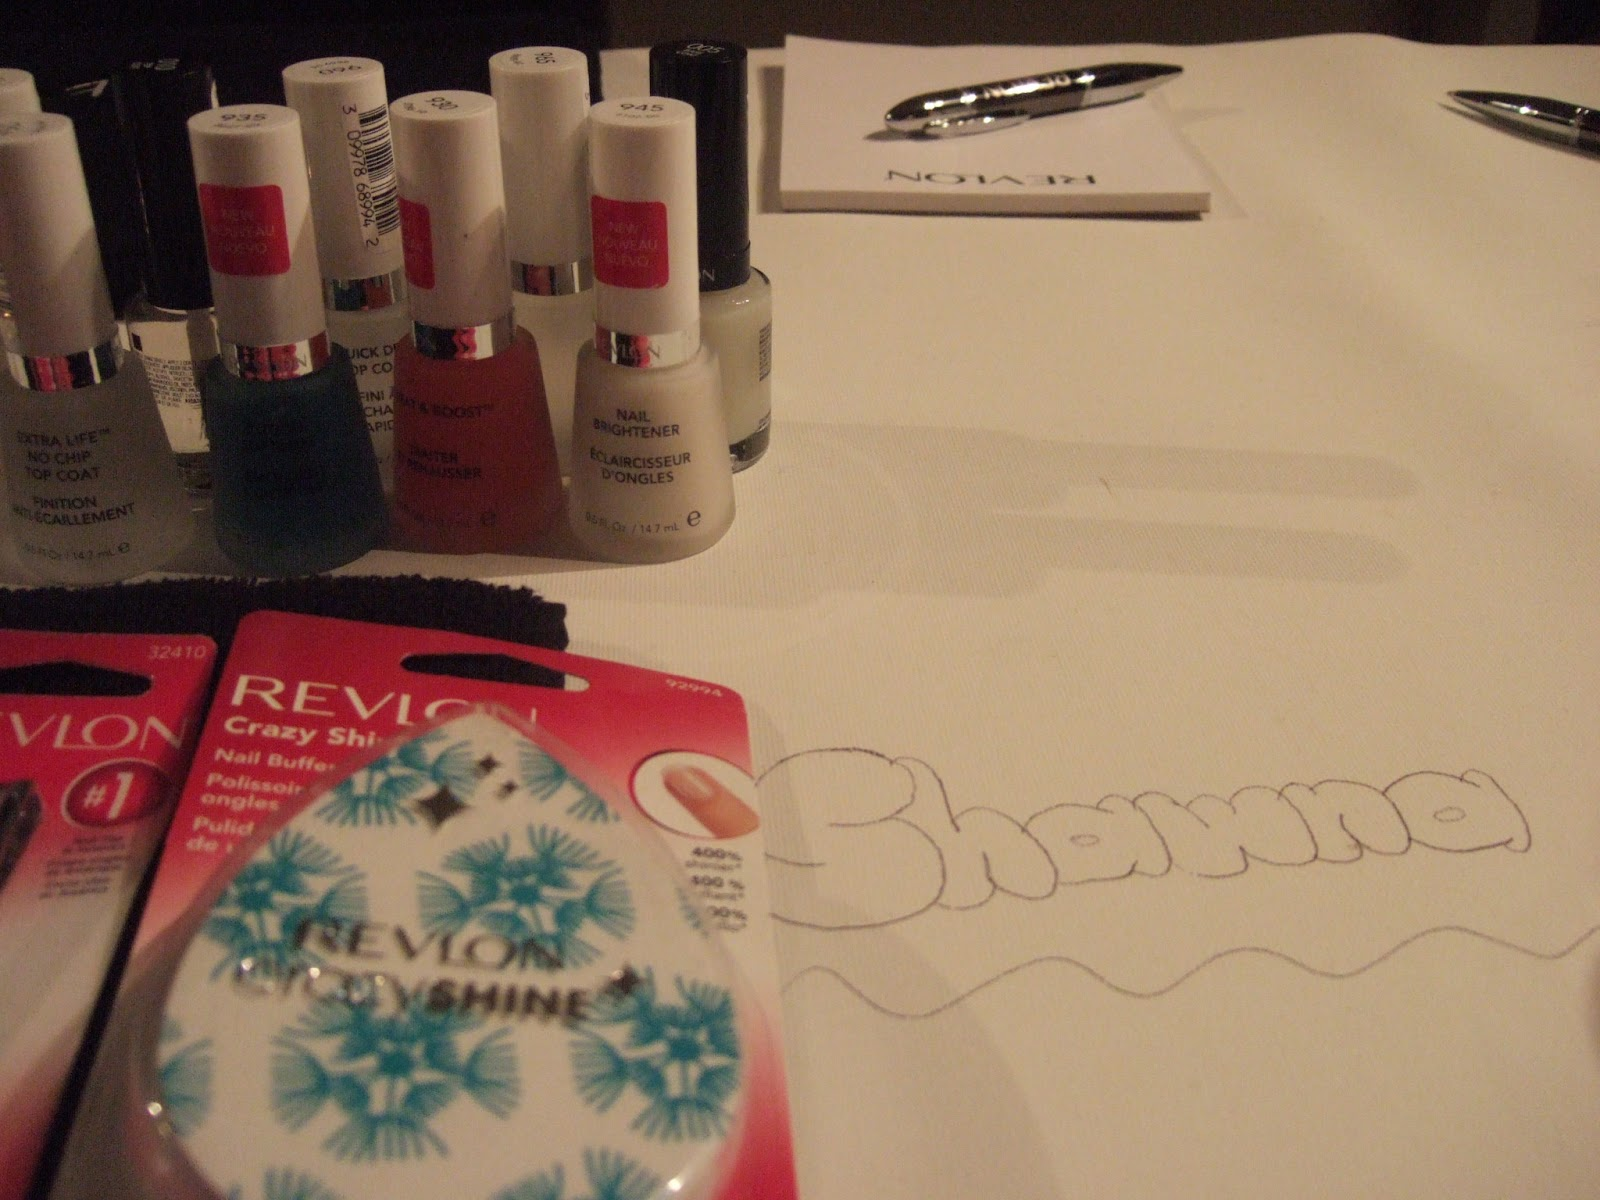 Revlon Nail Art Event #RevlonNailArt